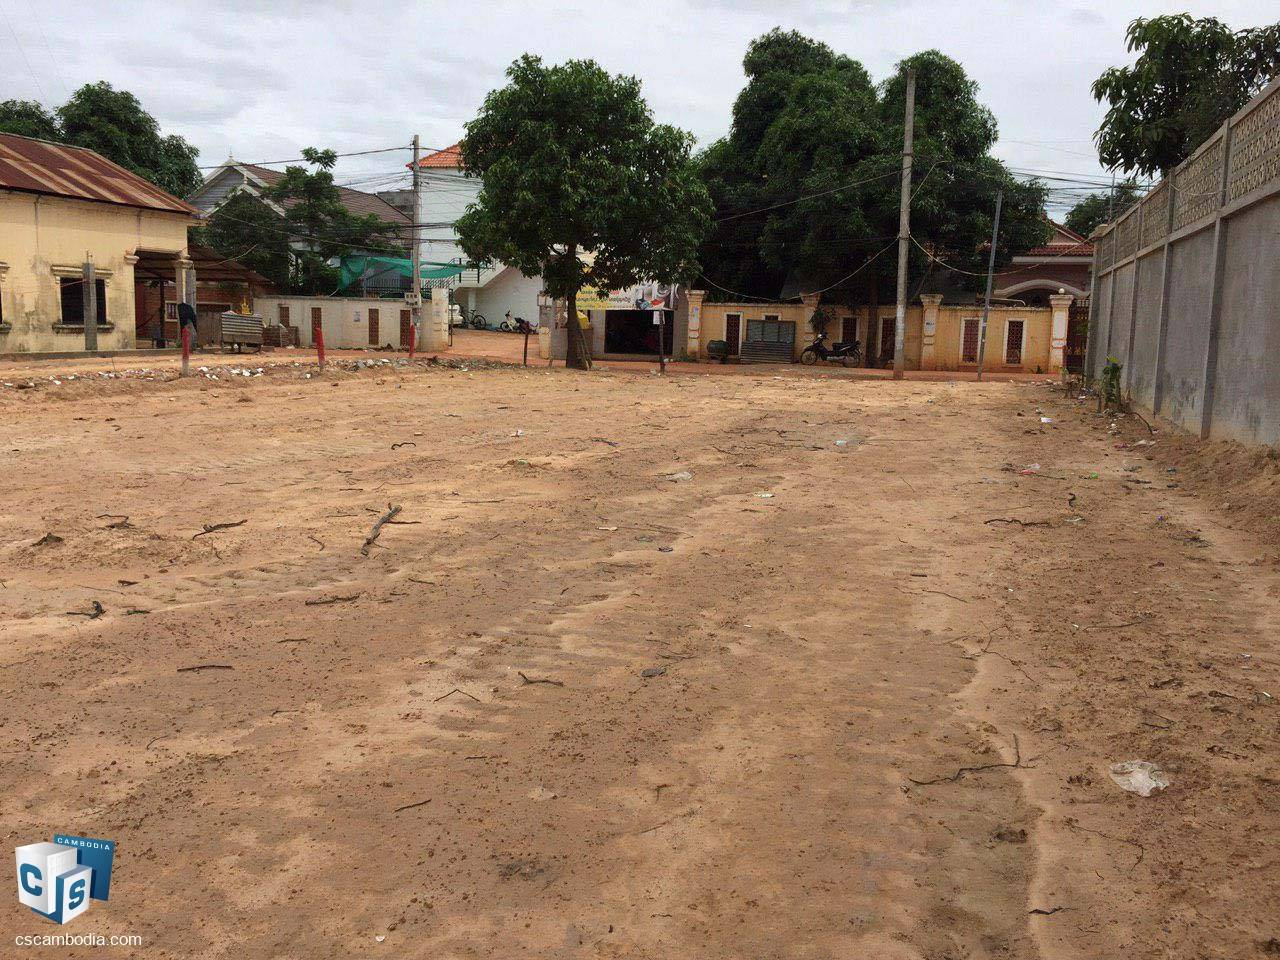 408 Sq meter Land – For Sale – Sala Kanseng Village – Svay Dangkum Commune – Siem Reap